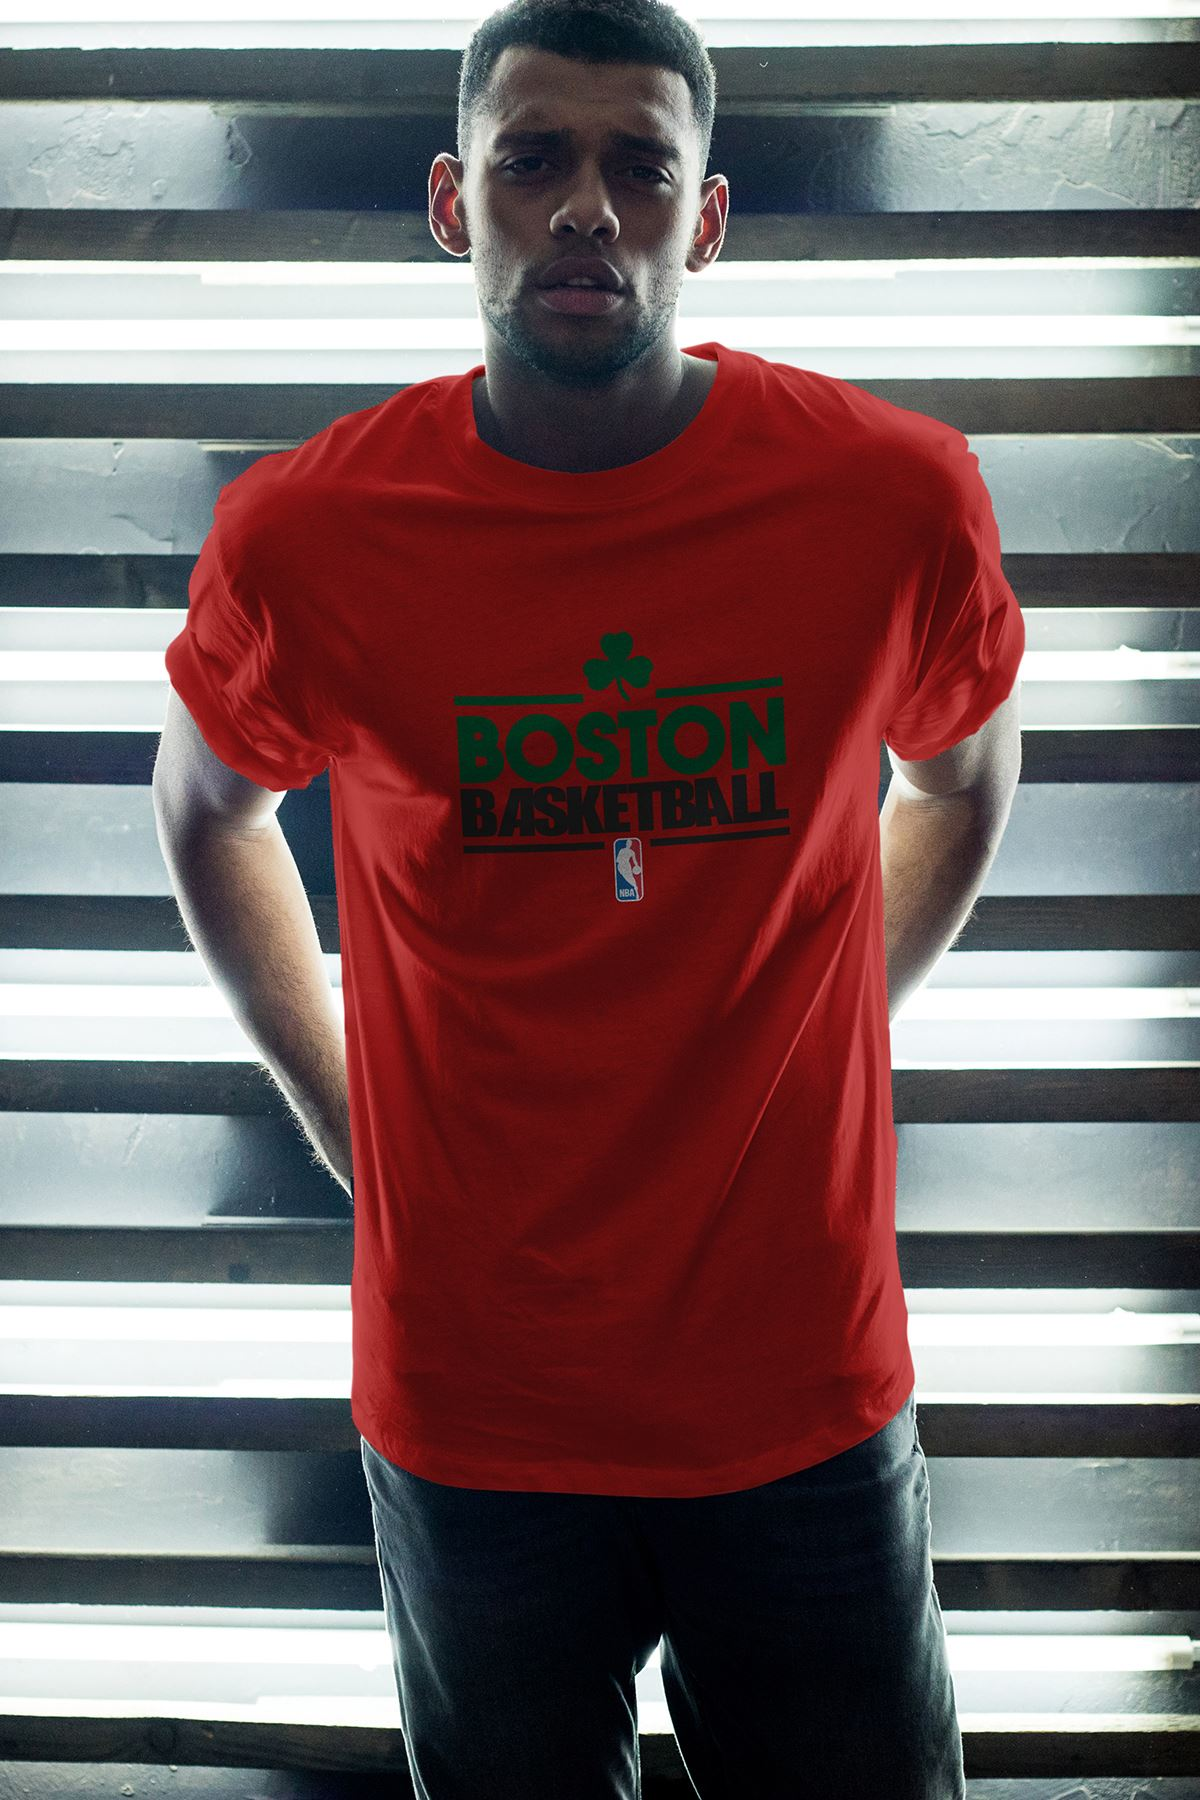 Boston Celtics 34 Kırmızı Erkek Oversize Tshirt - Tişört